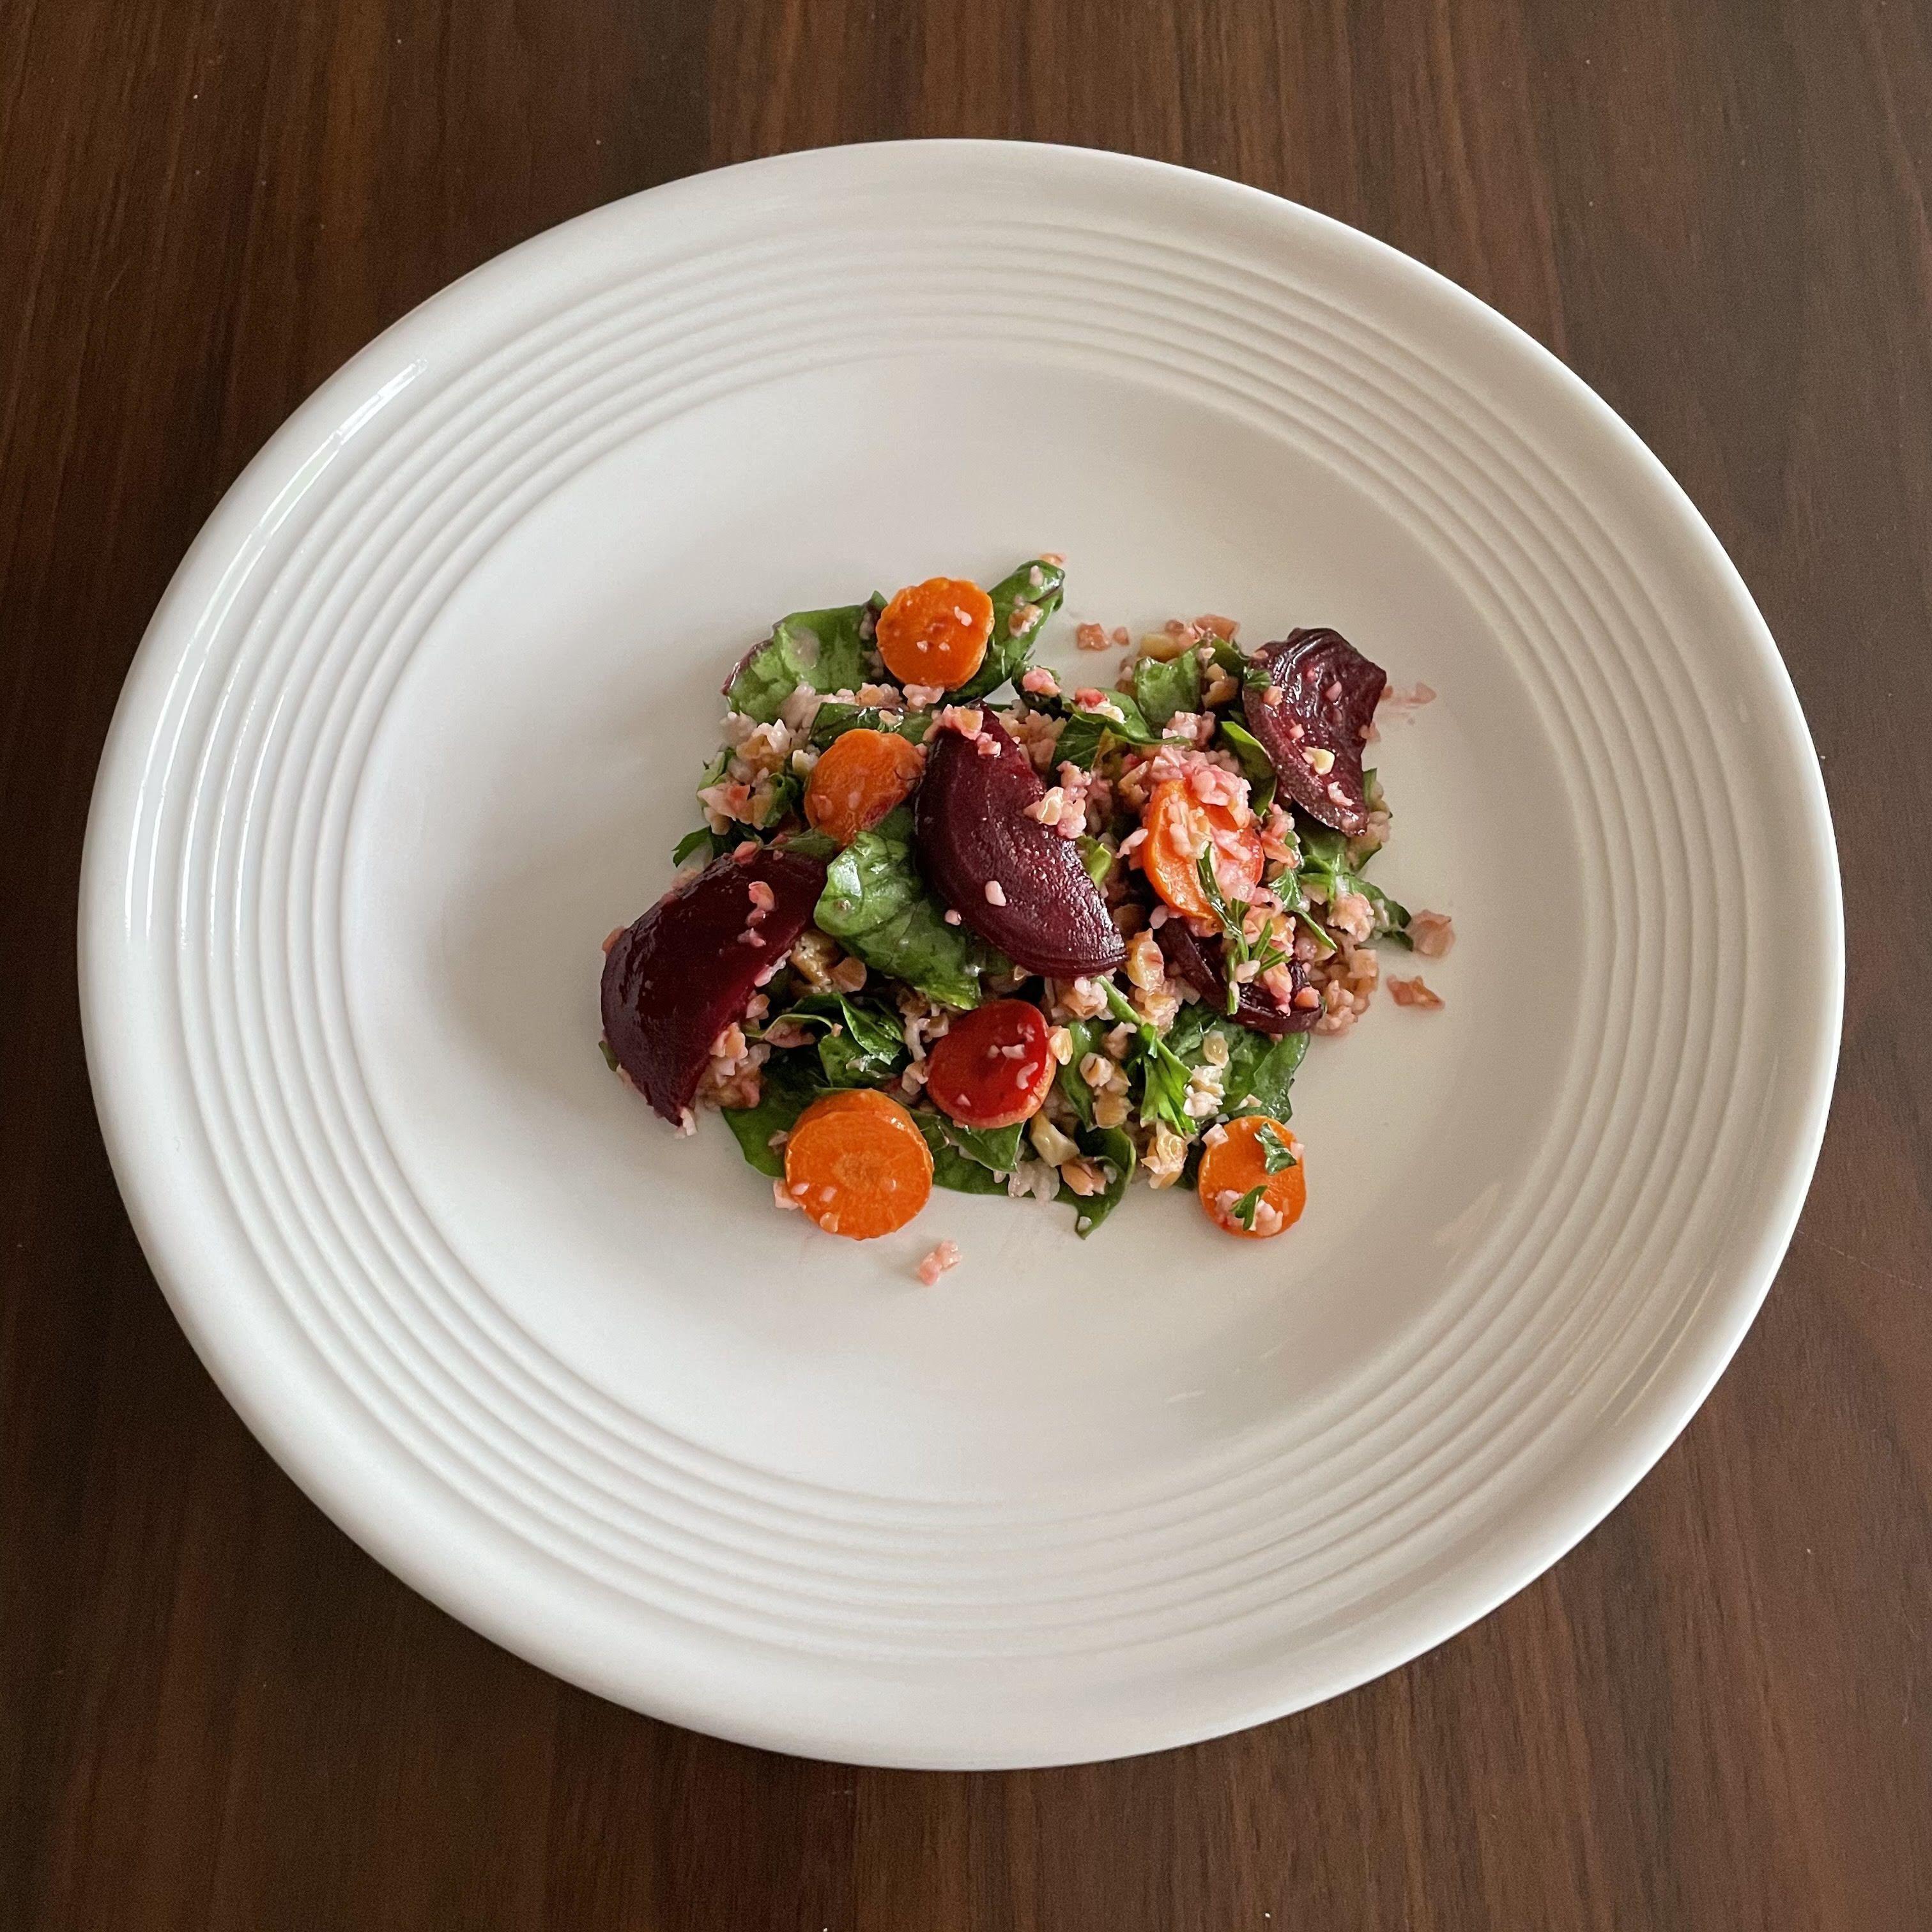 June: Great Grains Salad